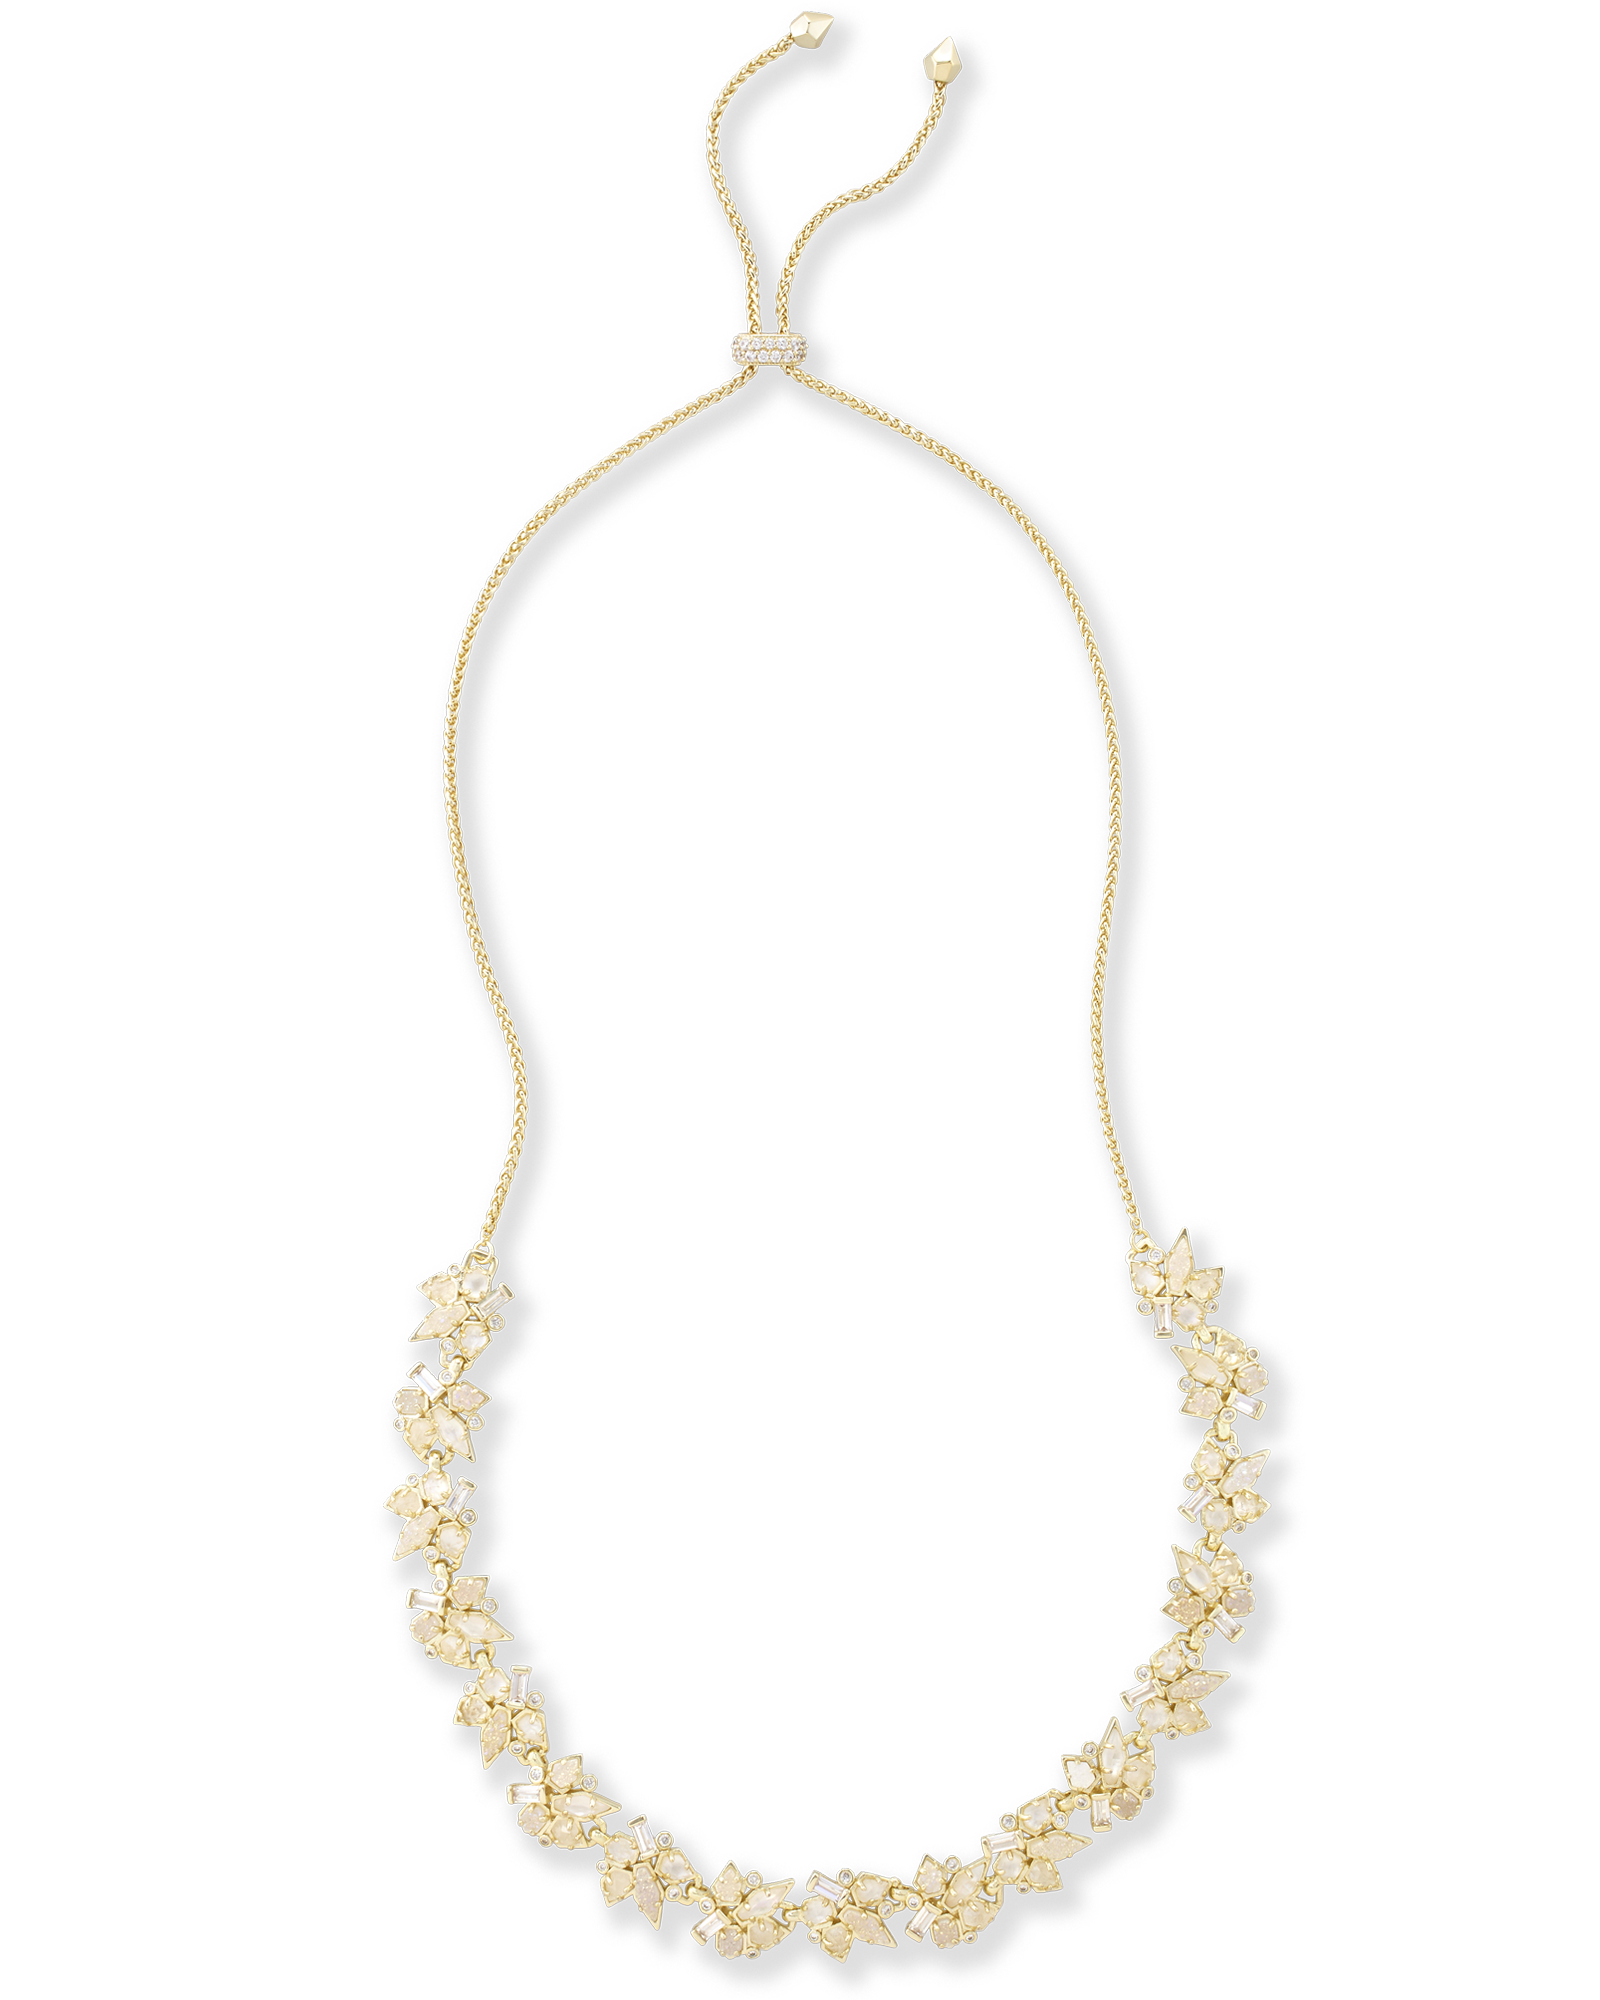 Andrina gold choker necklace in lustr kendra scott for Kendra scott fine jewelry